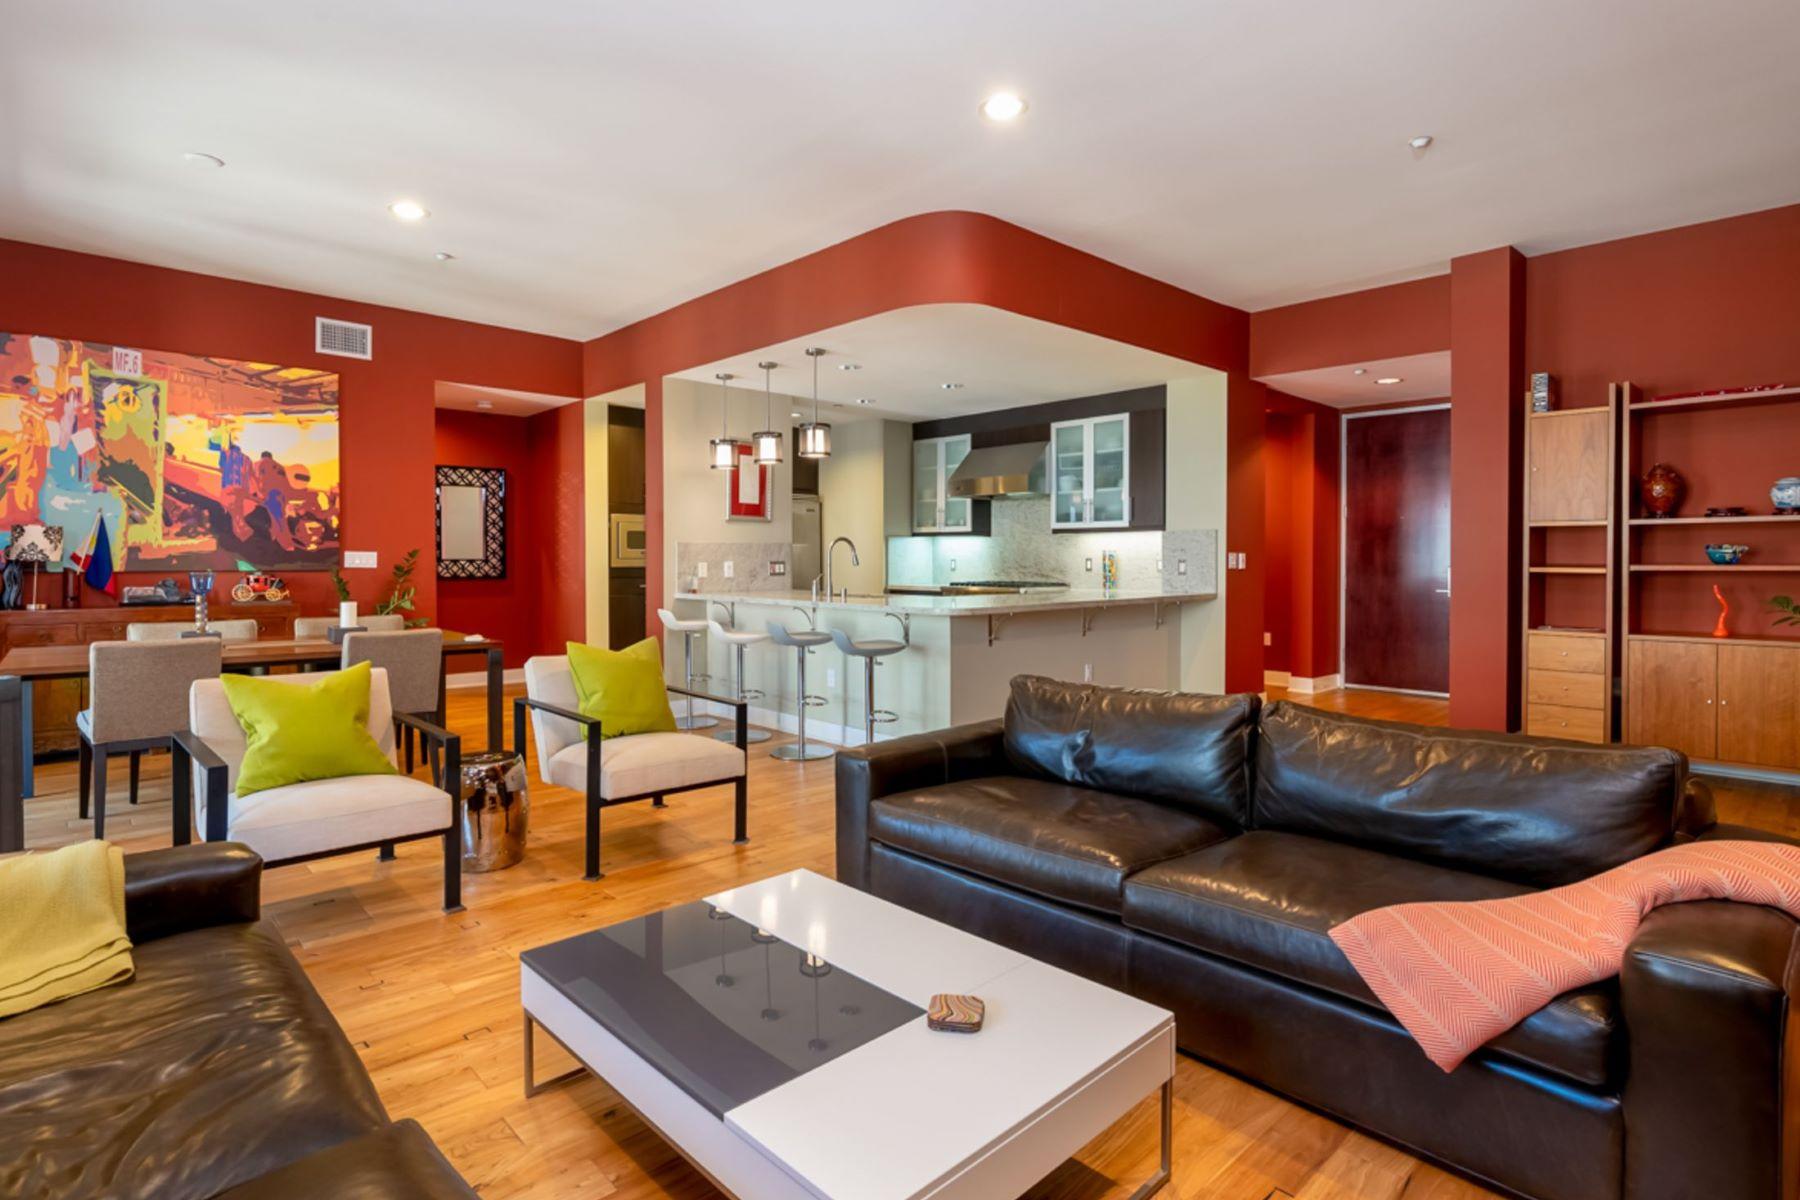 Condominiums 为 销售 在 402 Rockefeller #408 尔湾市, 加利福尼亚州 92612 美国